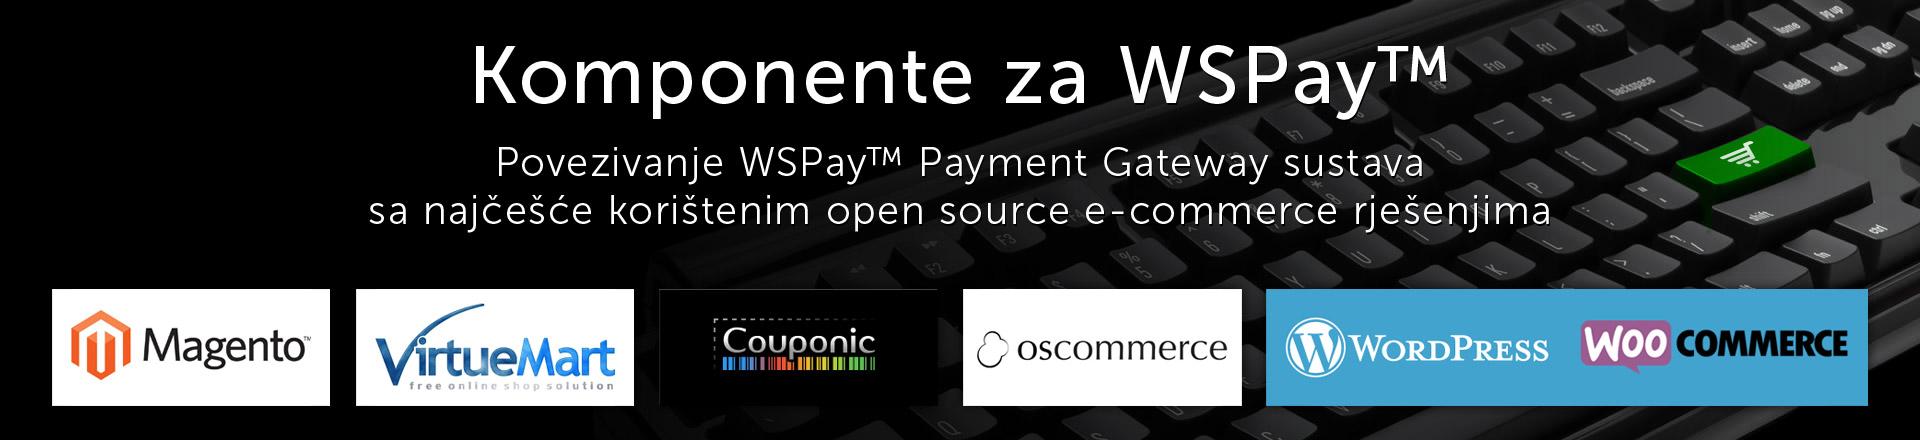 https://www.wspay.ba/Repository/Banners/wsPayKomponente-1920x440.jpg